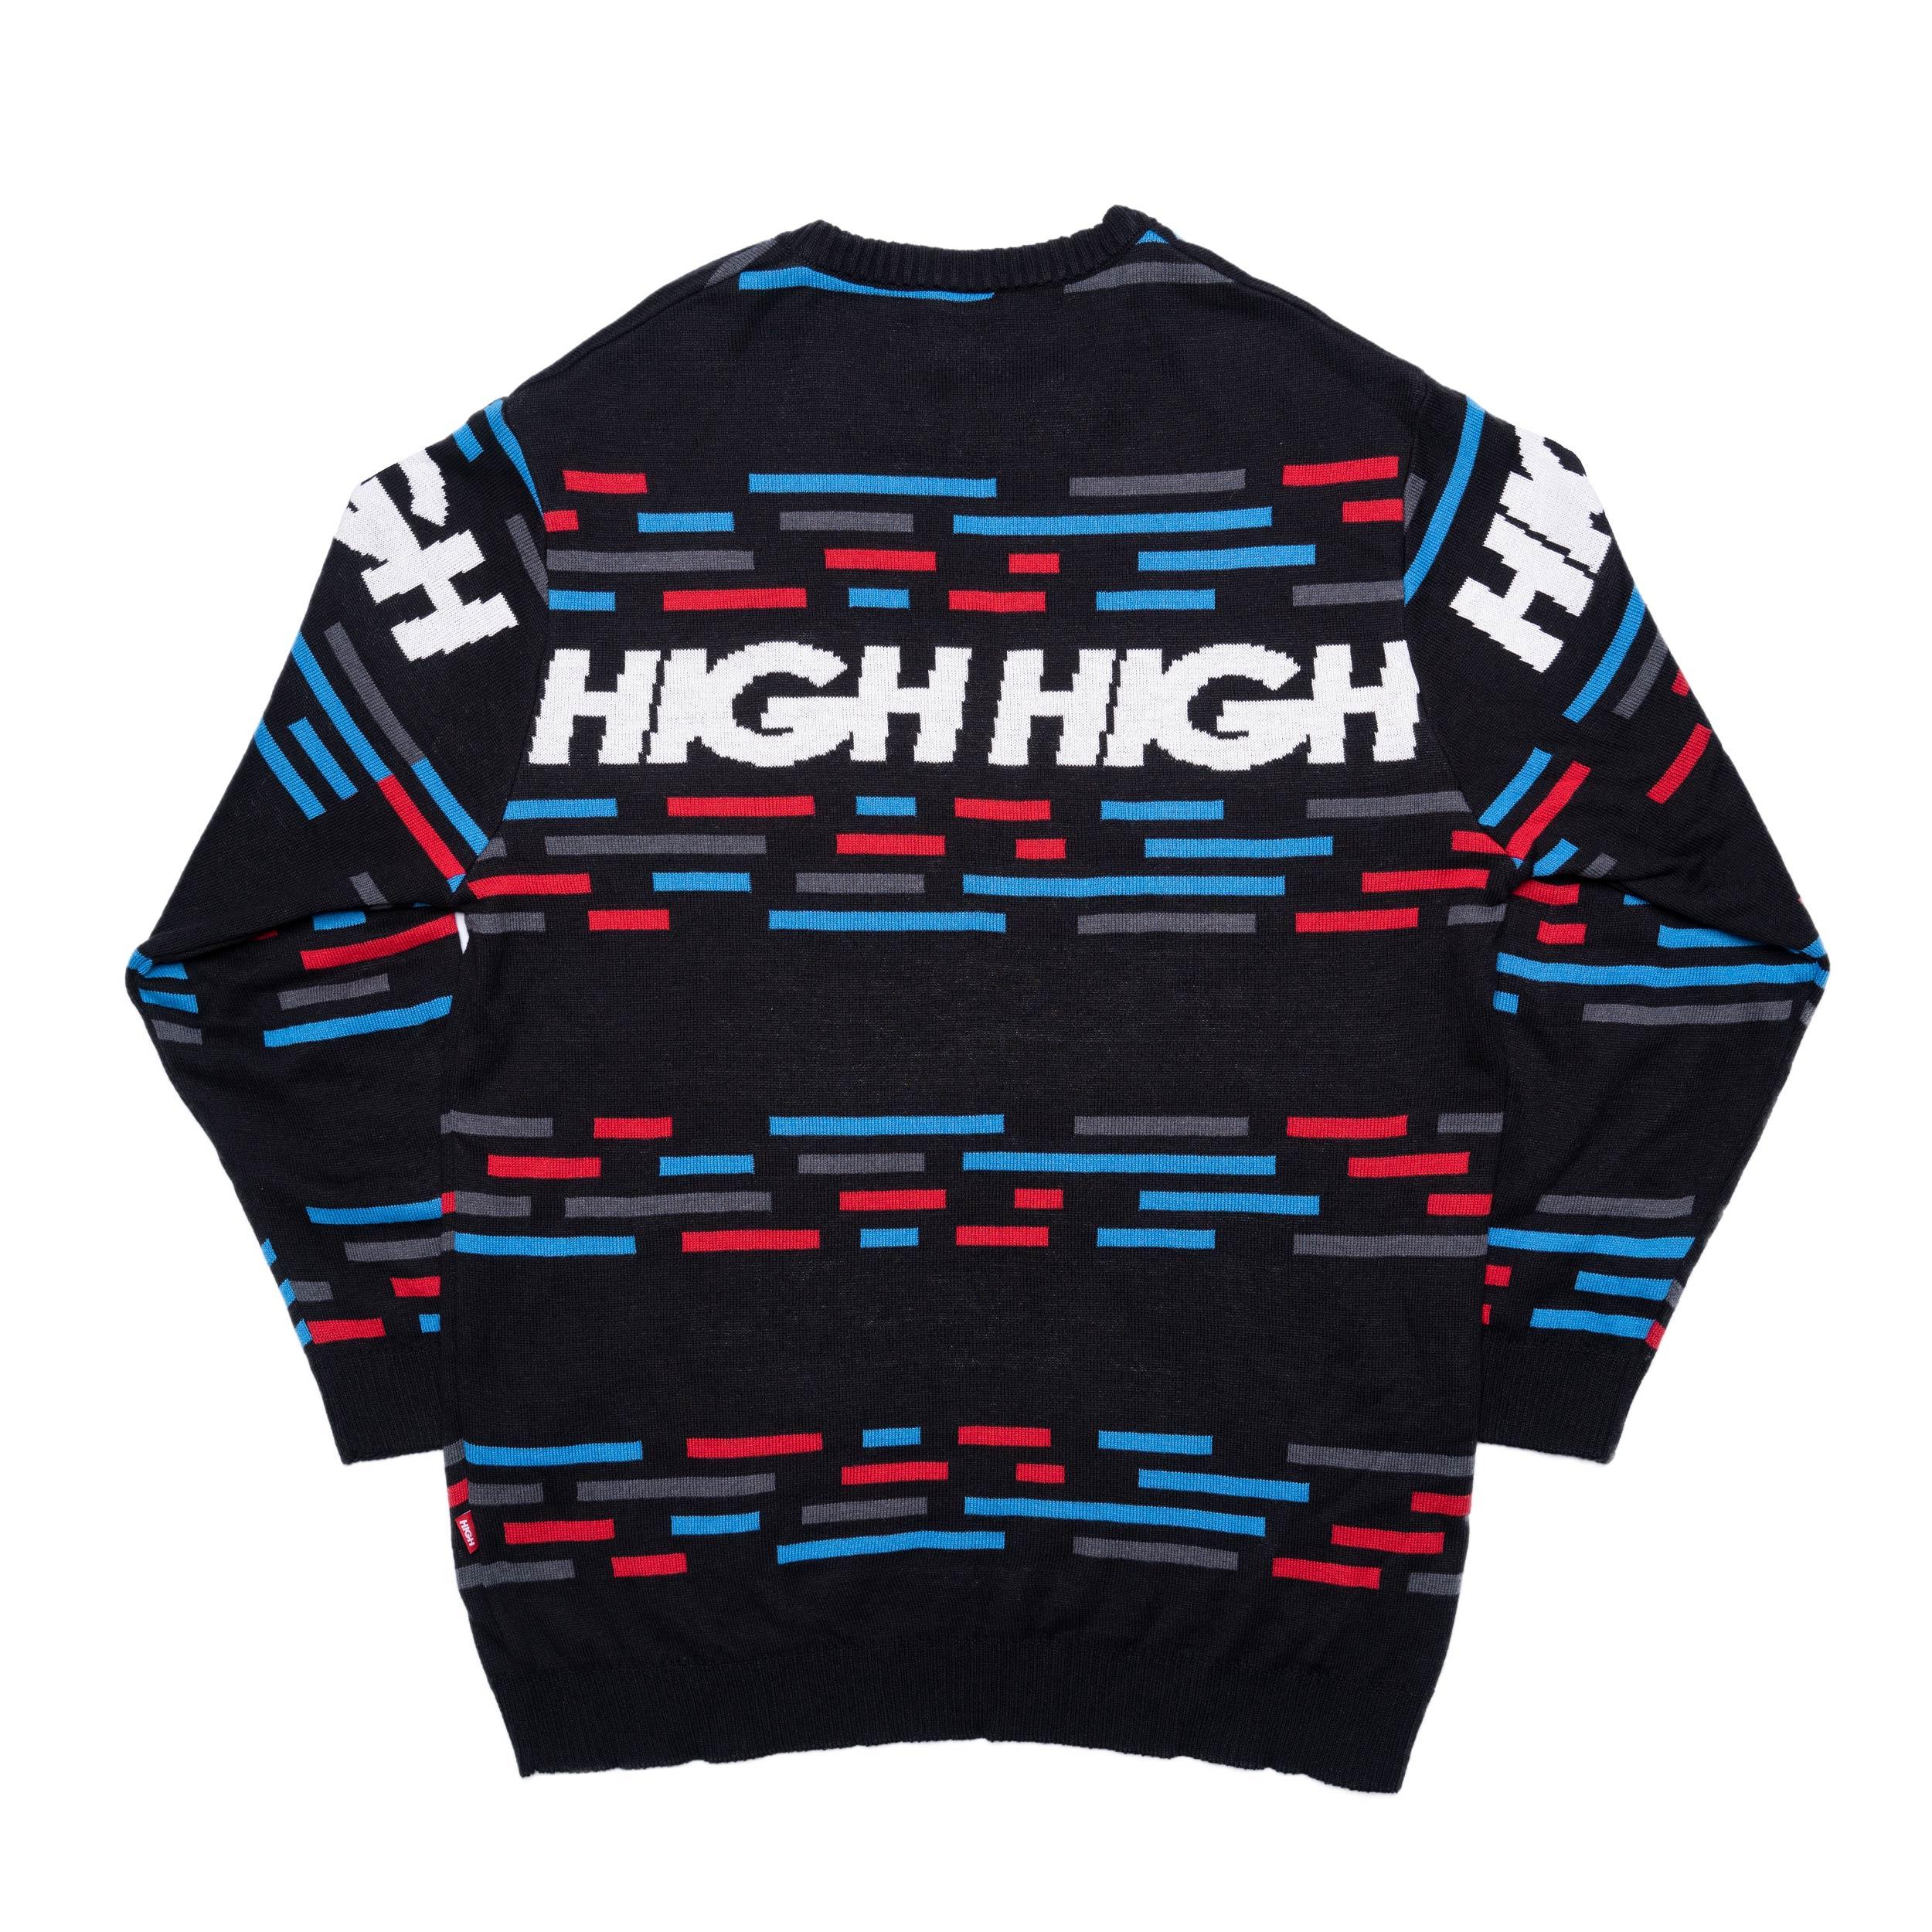 Knitwear_RGB_Black